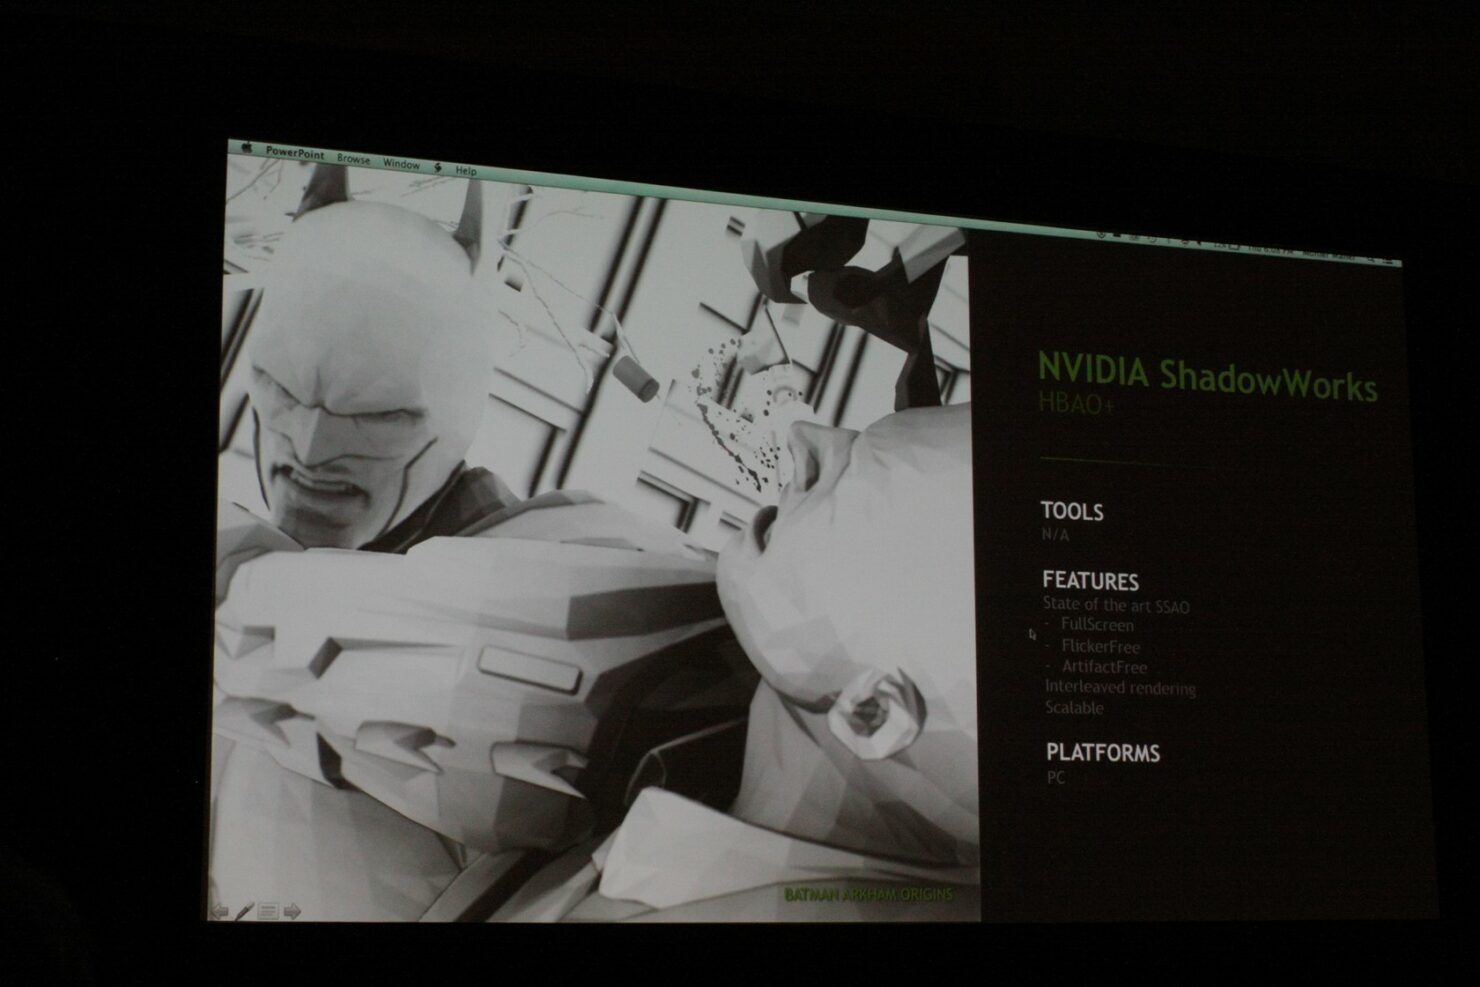 nvidia-shadowworks